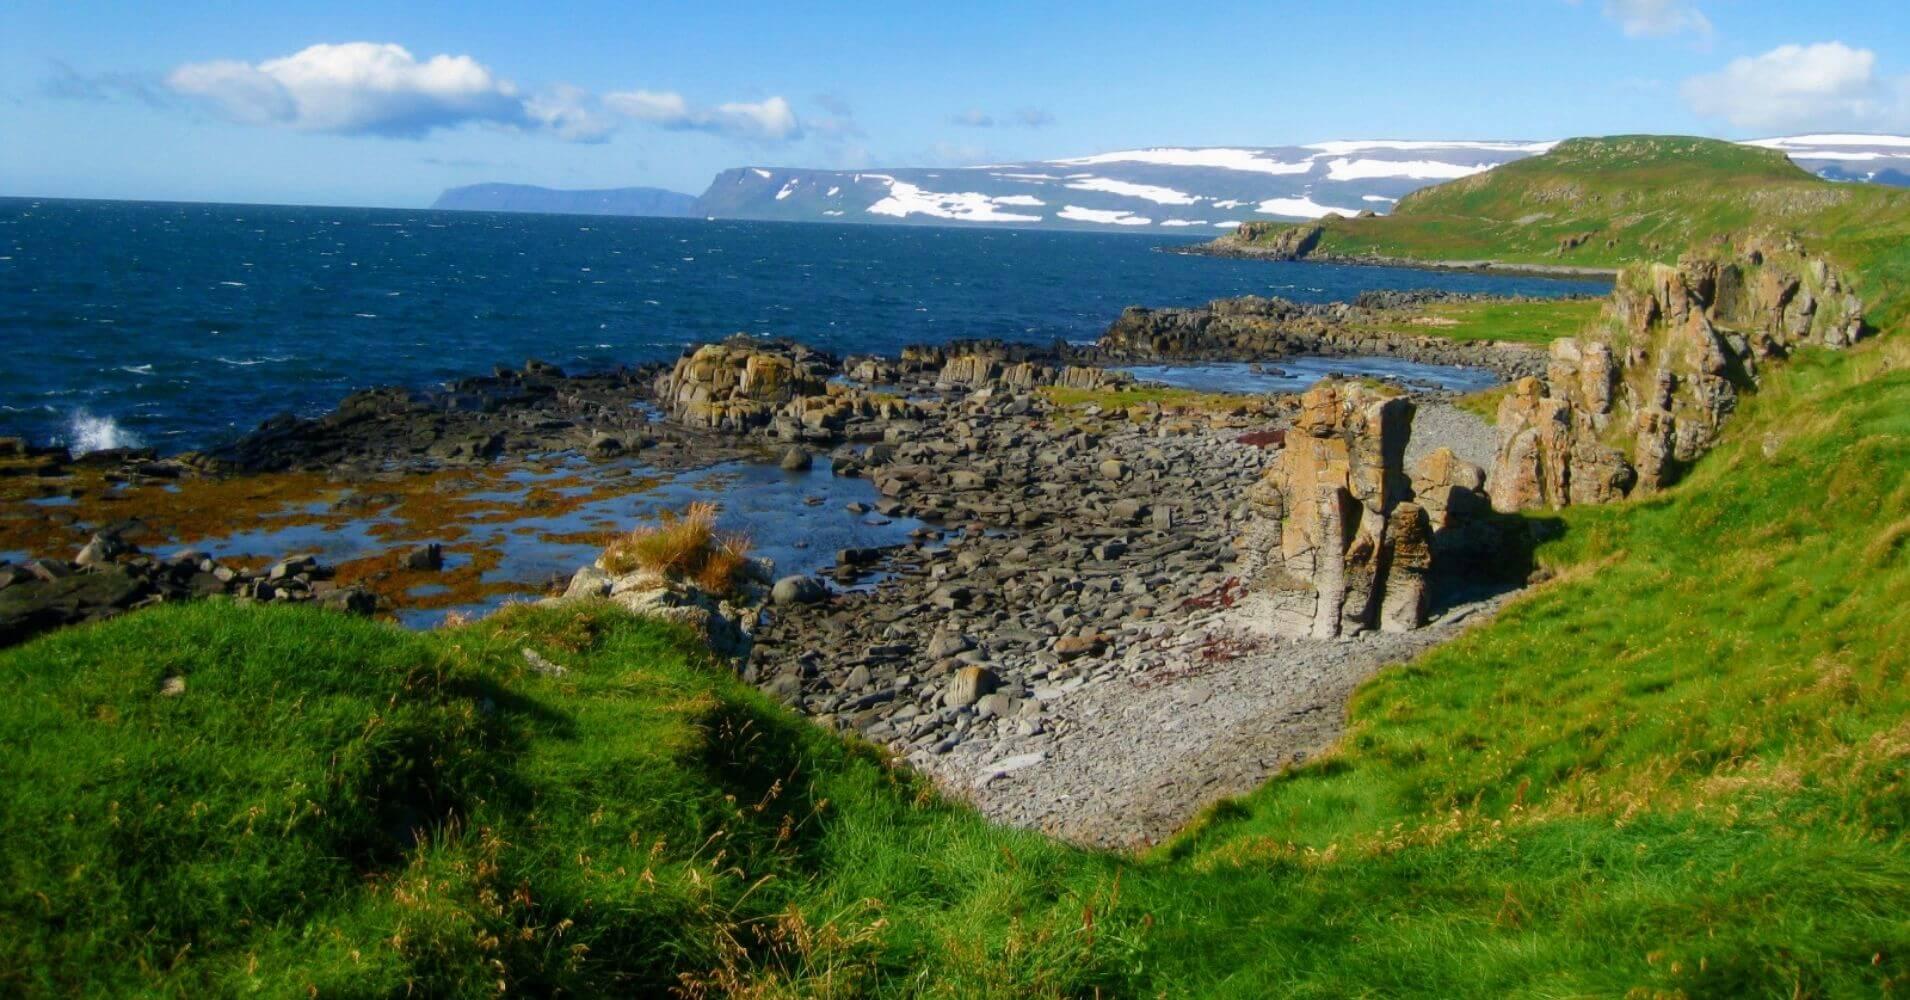 Formaciones Volcánicas. Ísafjörður. Vestfirðir. Islandia.